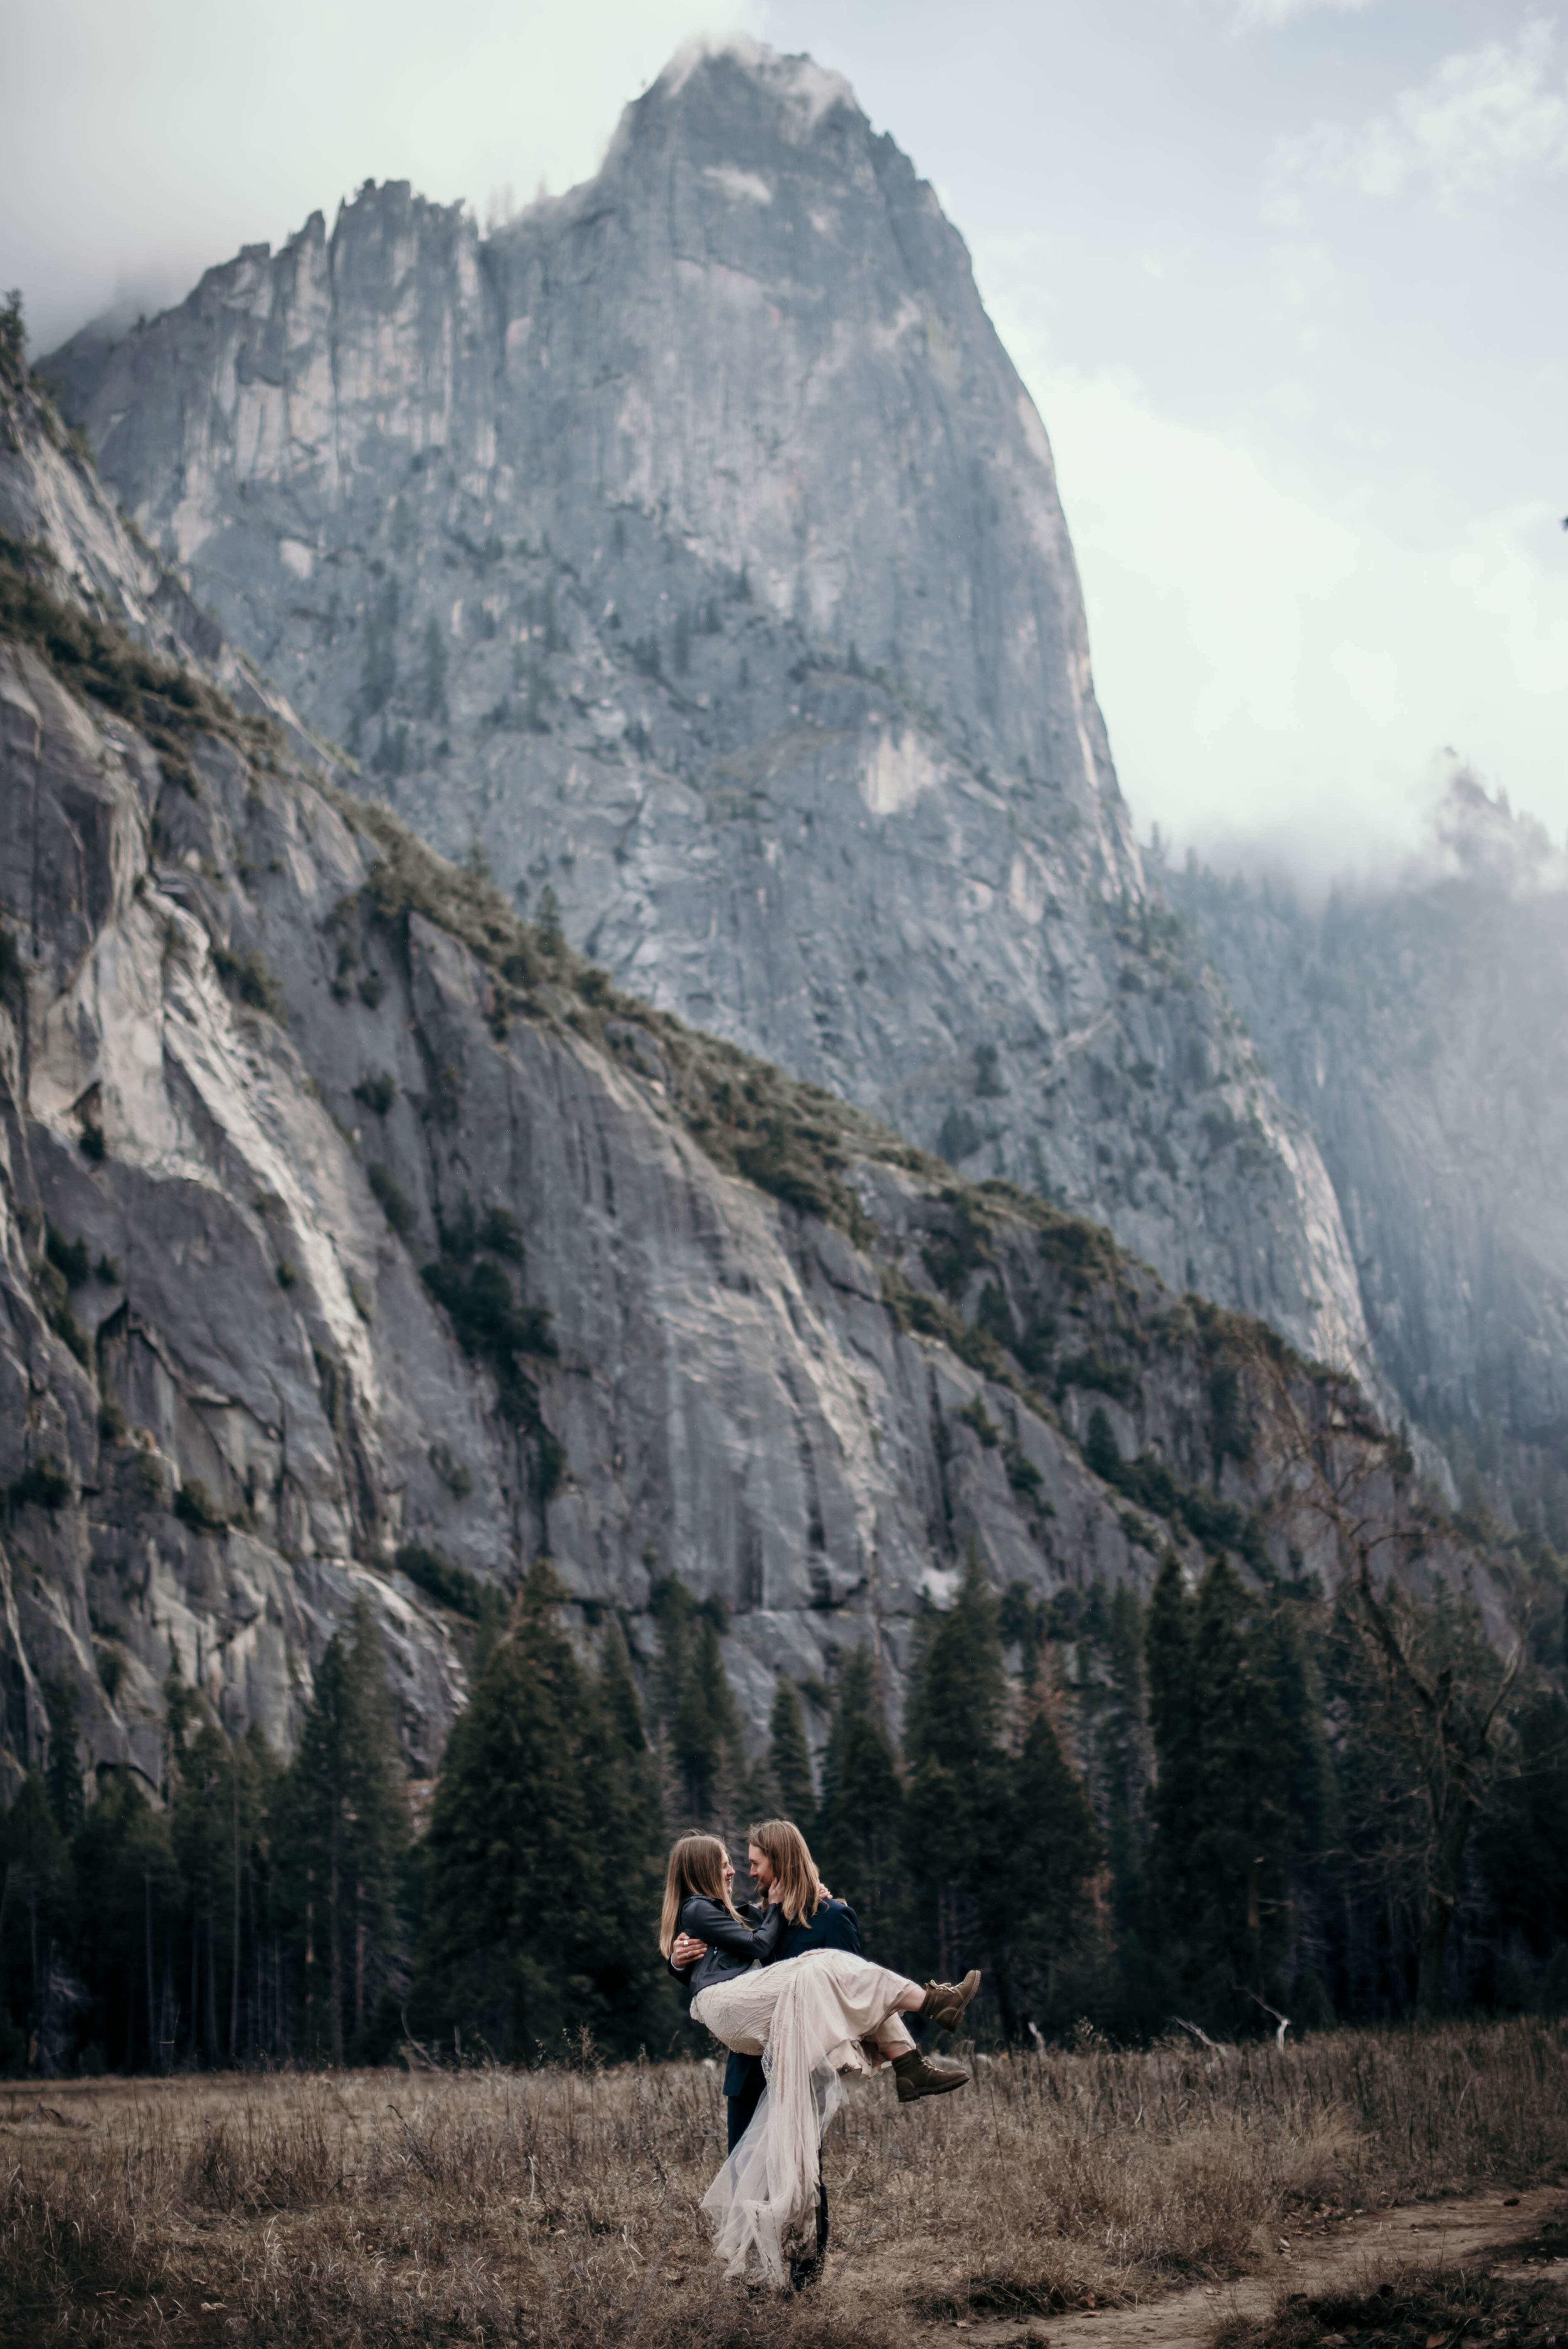 Adventure-Elopement-Yosemite-Valley-6.jpg